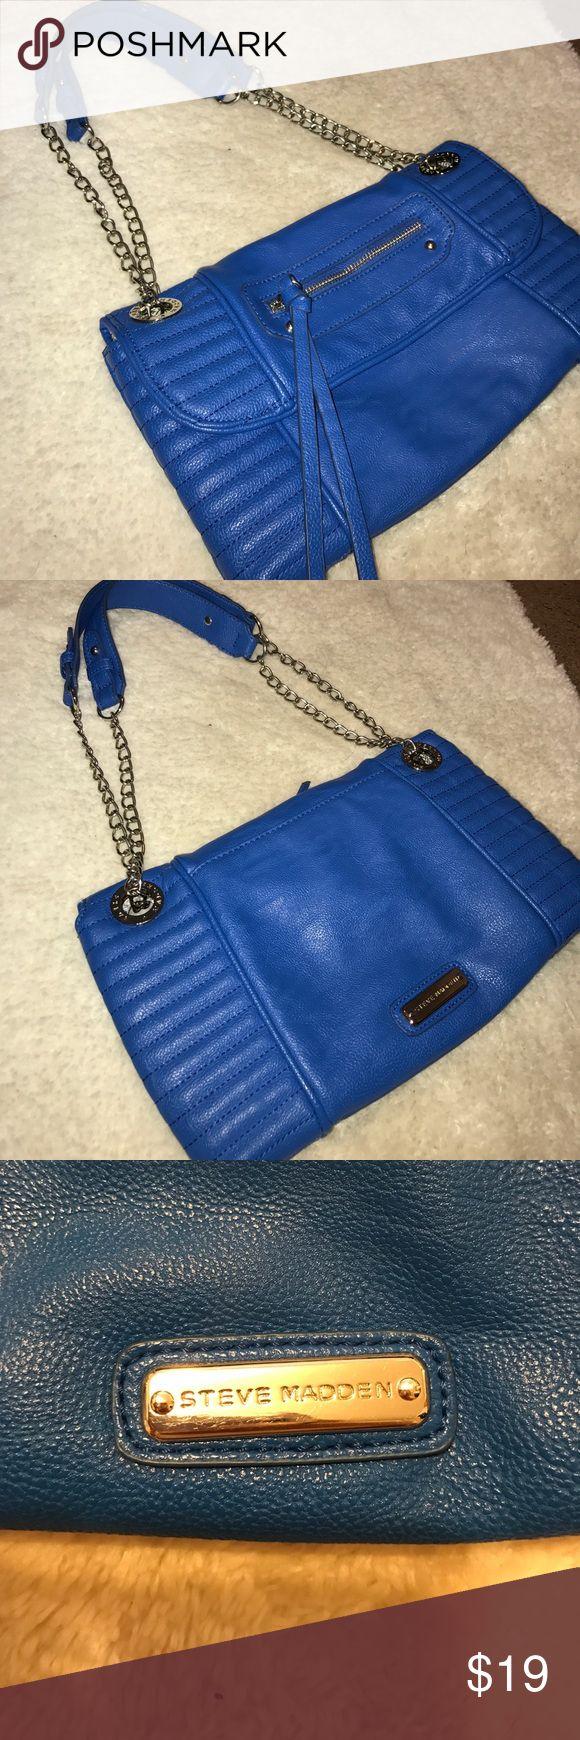 Royal blue Steve Madden purse Royal blue Steve Madden purse. Stripped pattern inside. Great condition! Steve Madden Bags Shoulder Bags